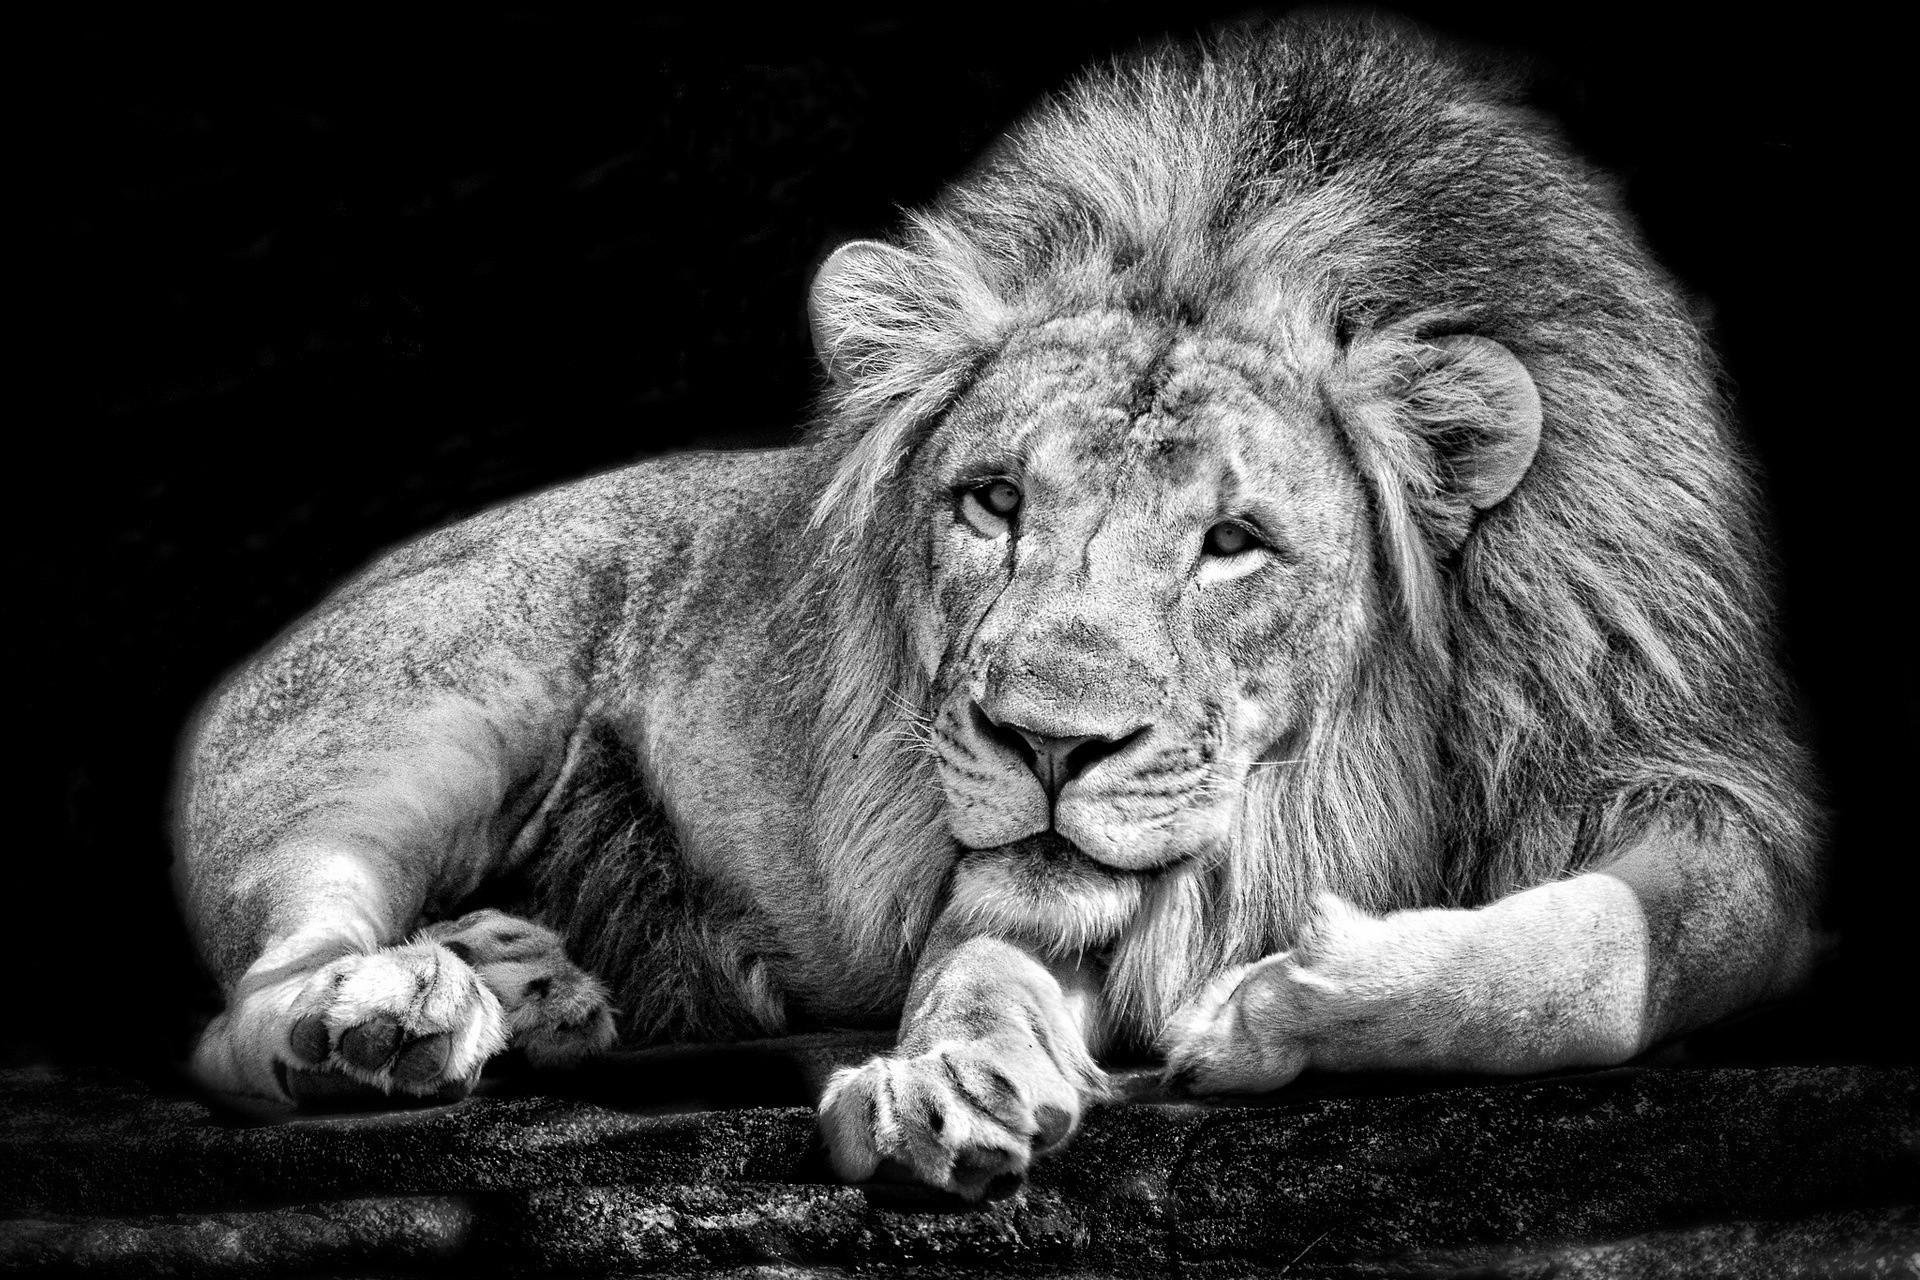 Face White Black Animals Monochrome Photography Lion Wildlife Fur Big Cats Whiskers Head Eye Fauna Mammal